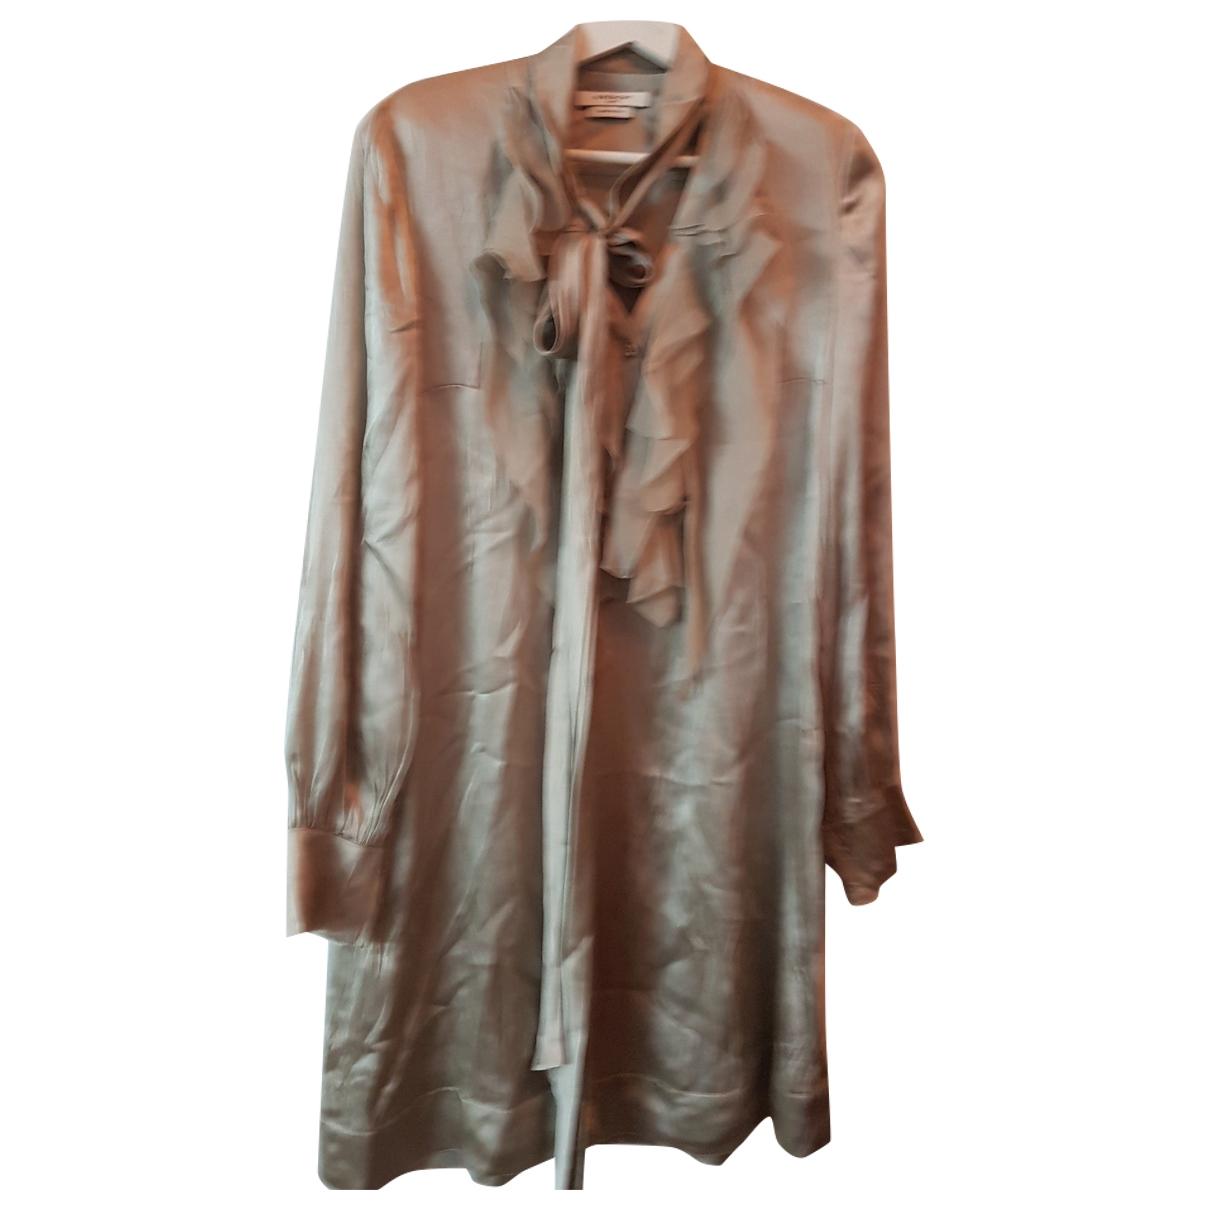 Givenchy \N Beige Silk dress for Women 44 IT